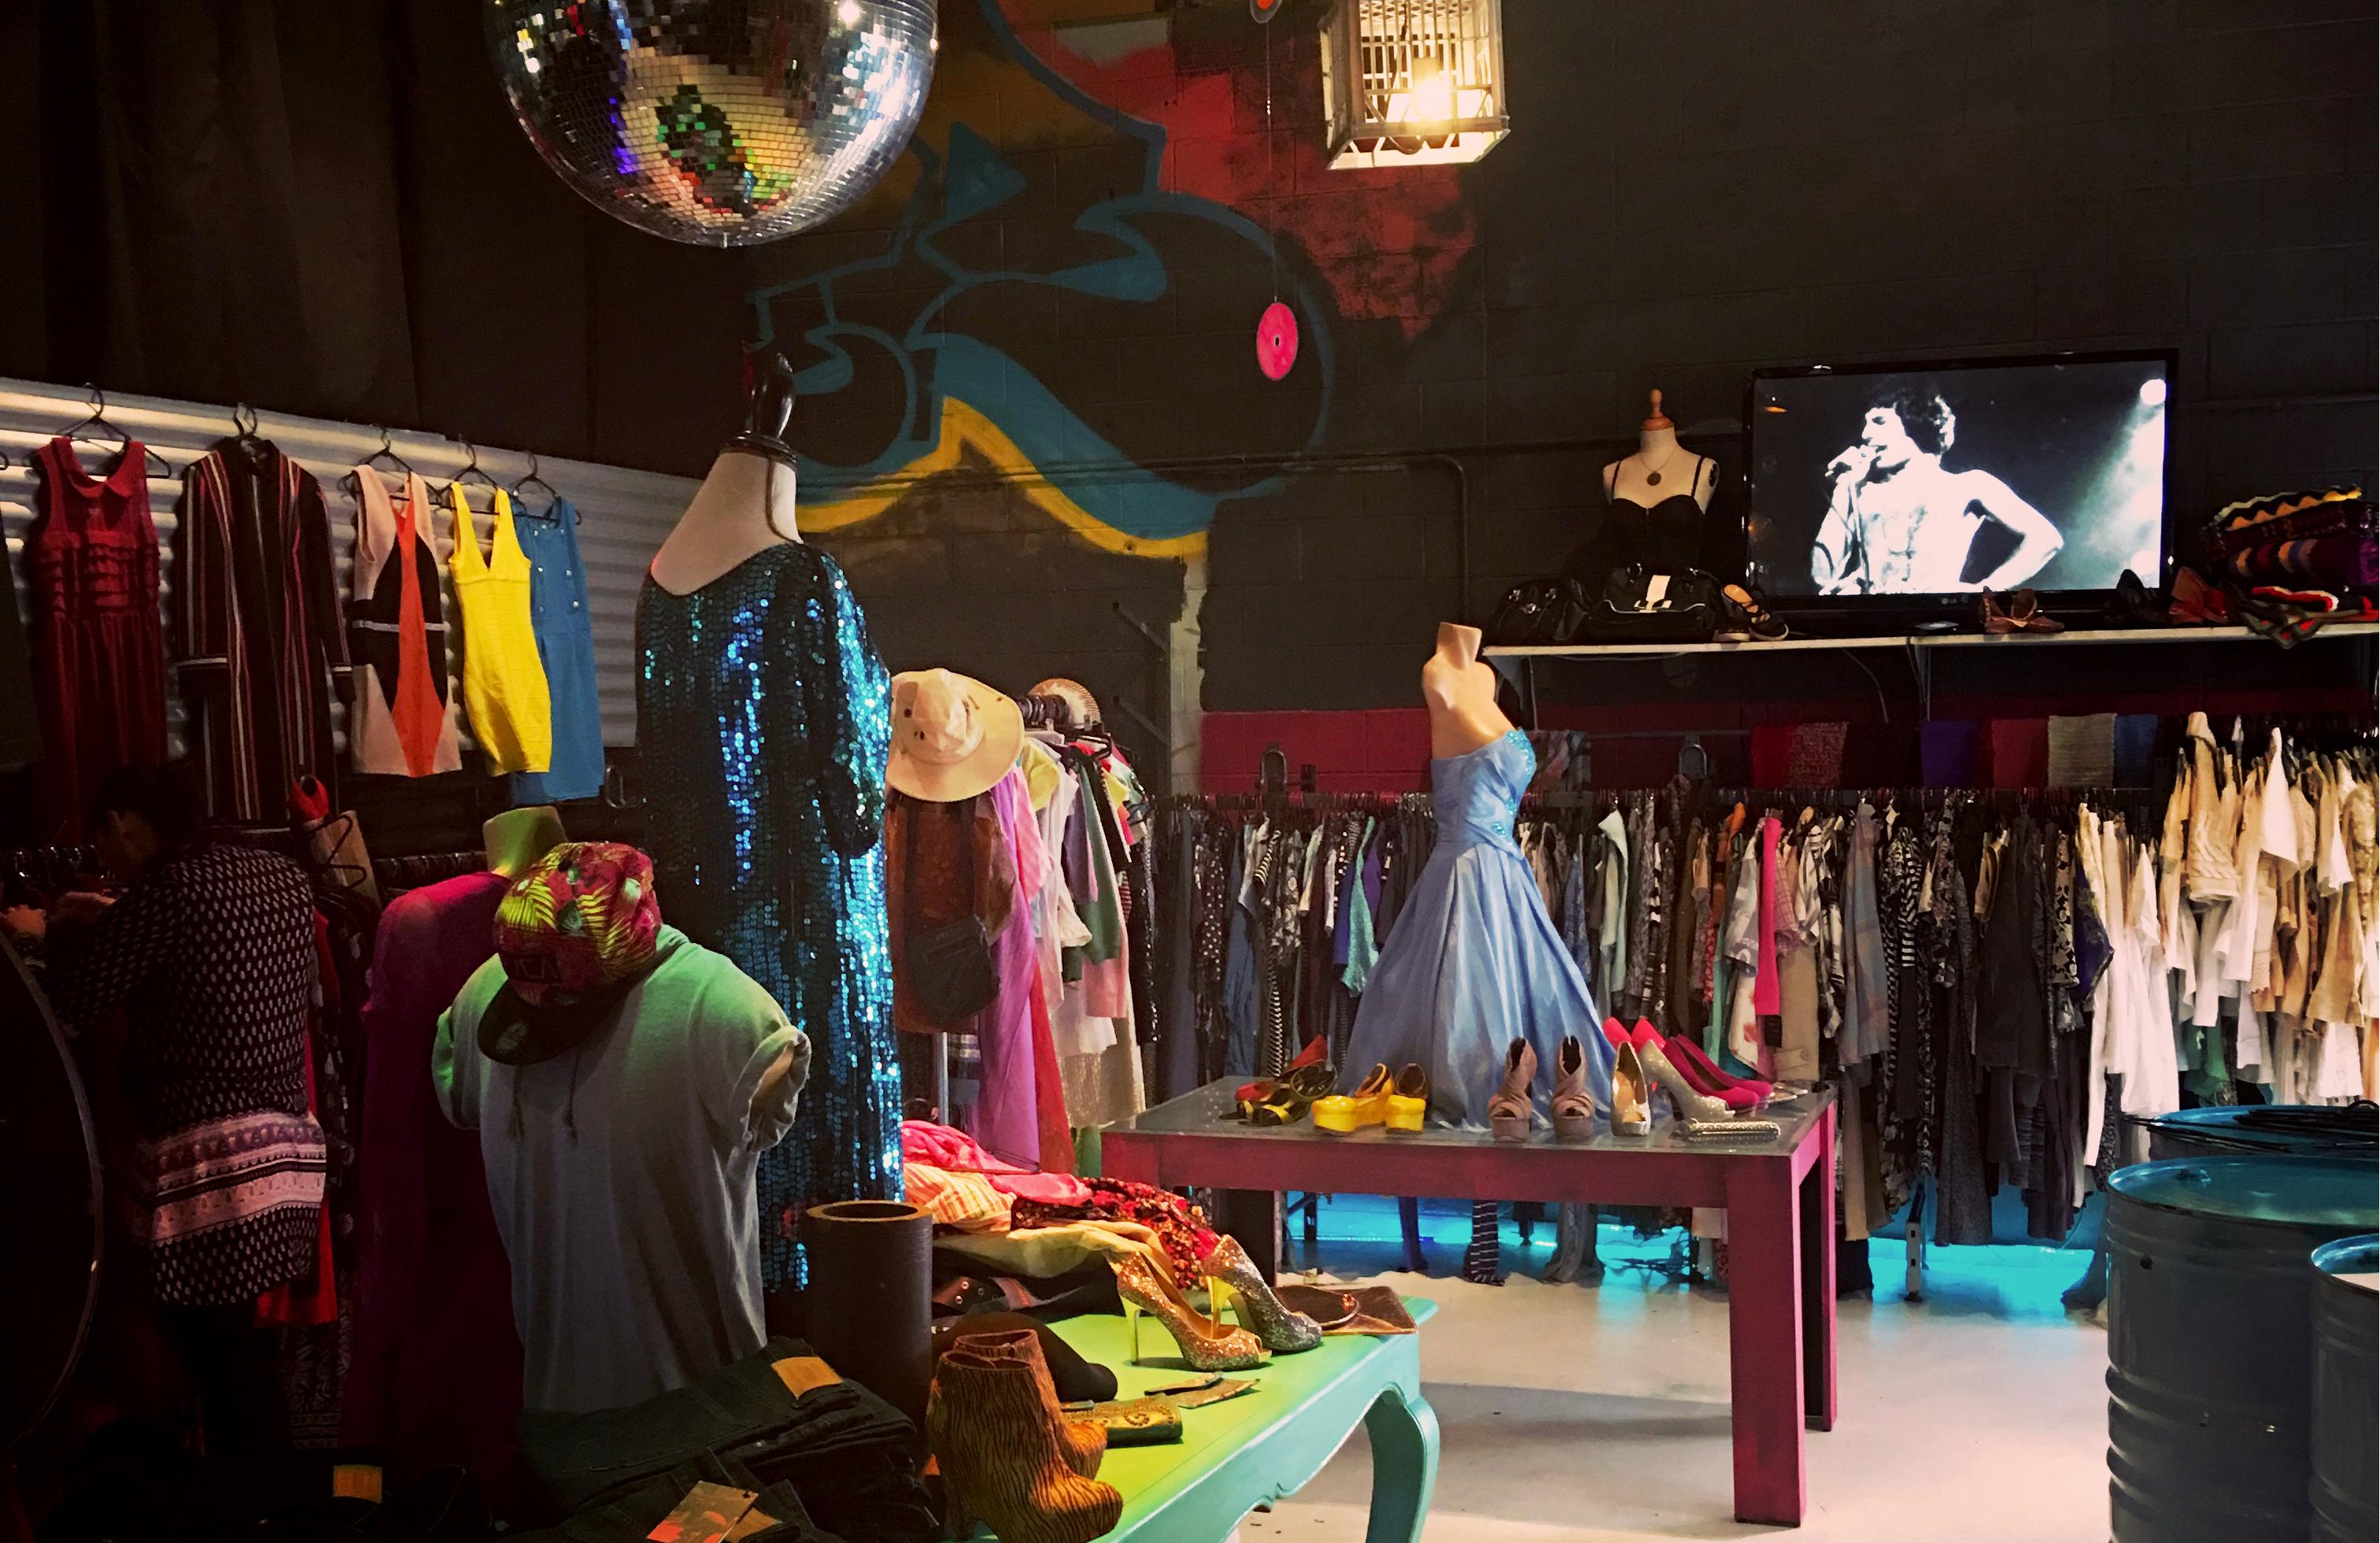 StudioThrifty4 op shop Brisbane – Pay a Sack Forward